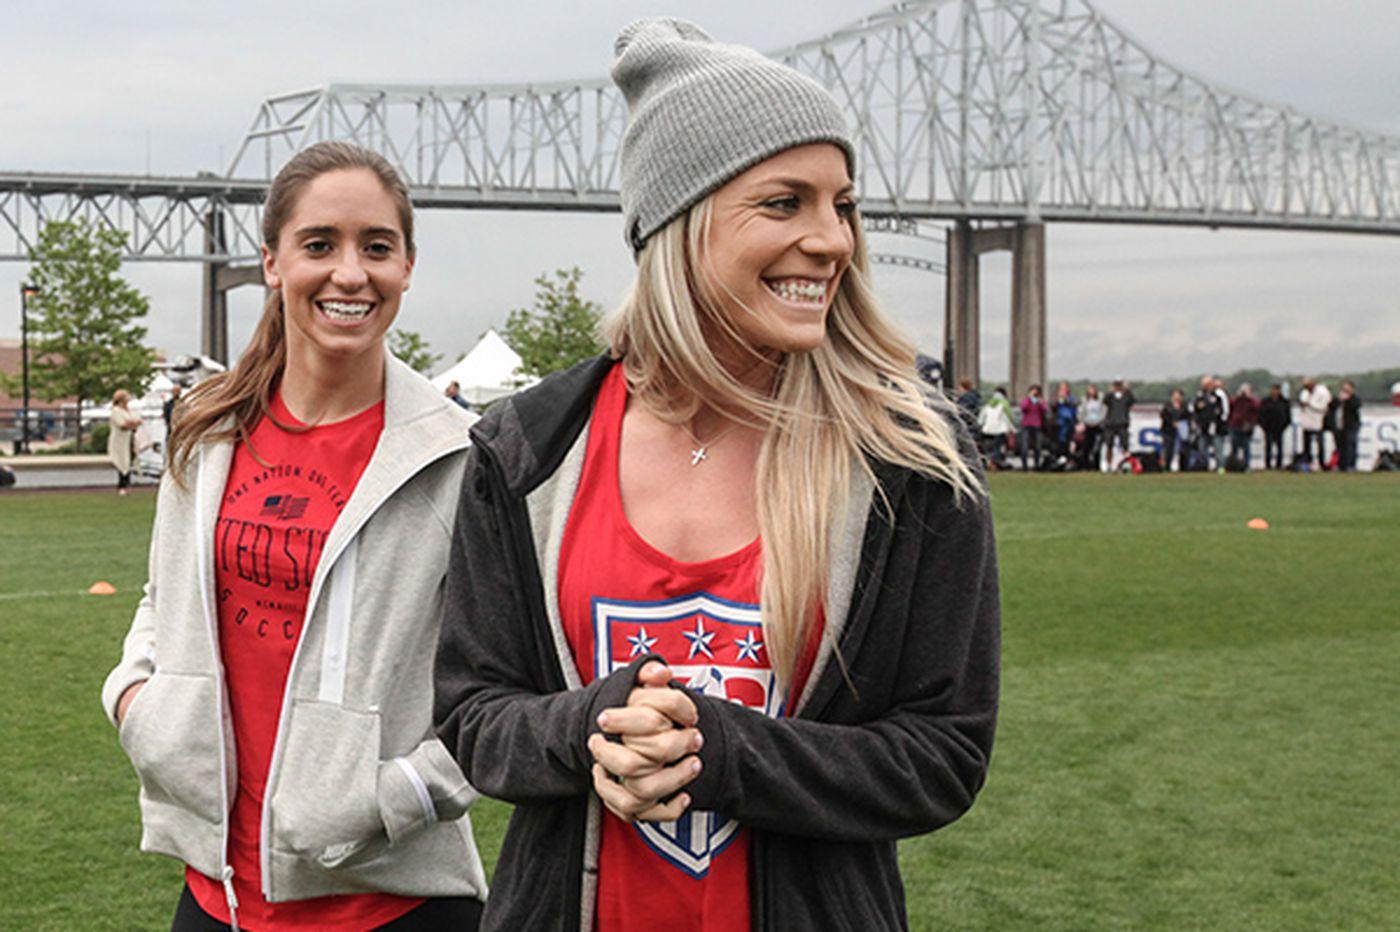 Julie Johnston steps into U.S. team's spotlight